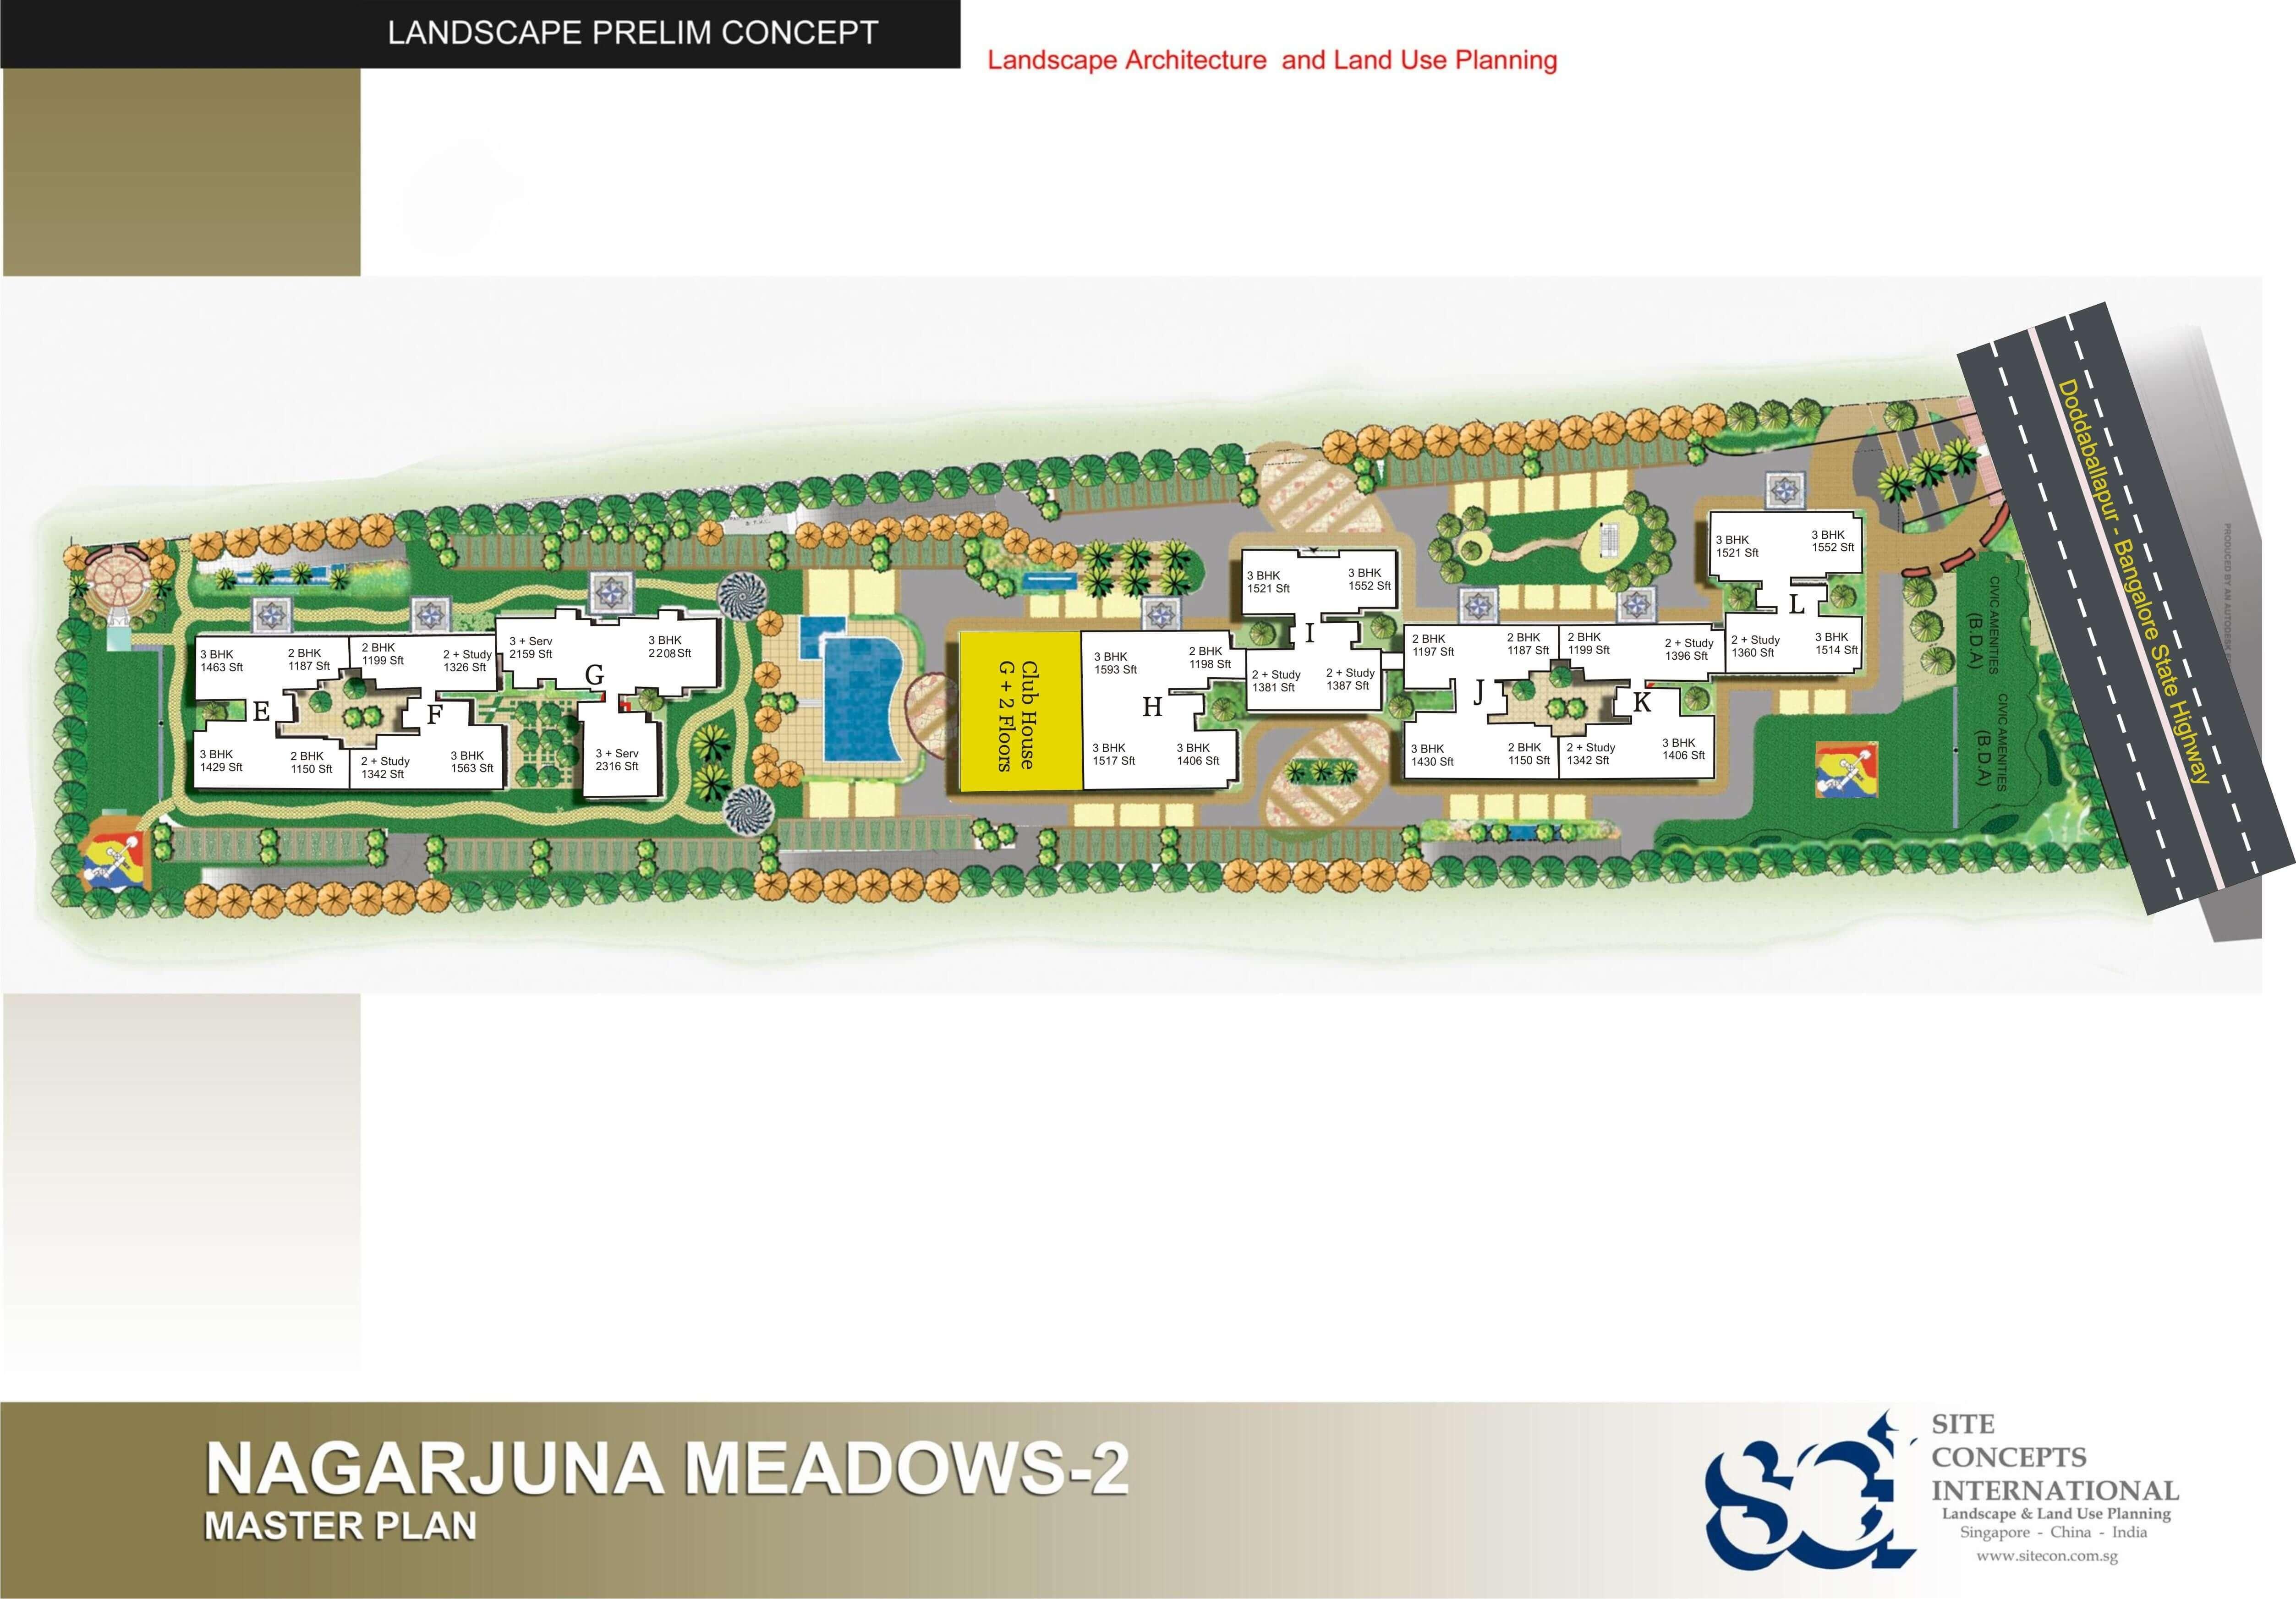 ncc nagarjuna meadows ii master plan image1